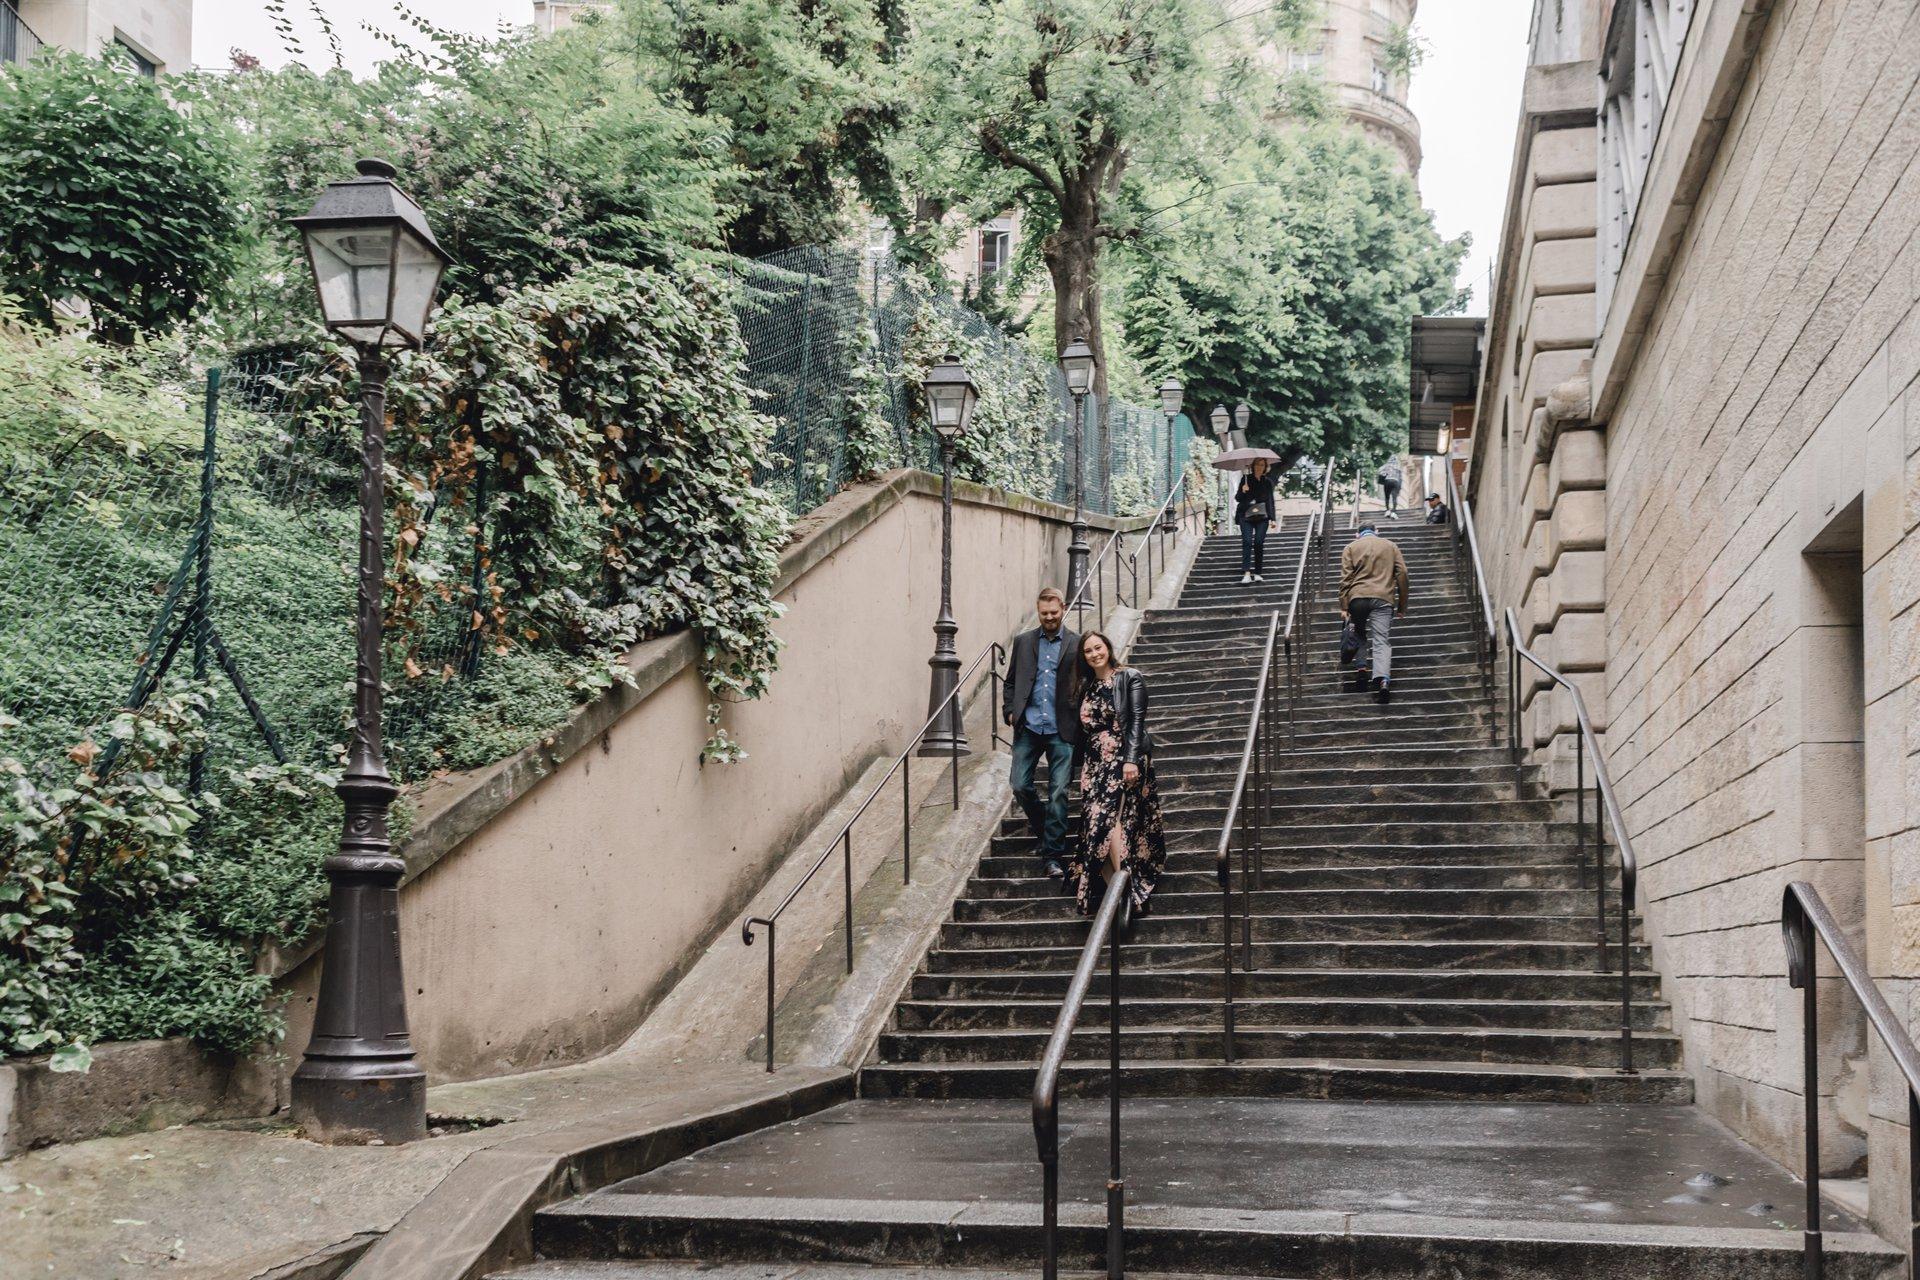 Paris-France-travel-story-Flytographer-59